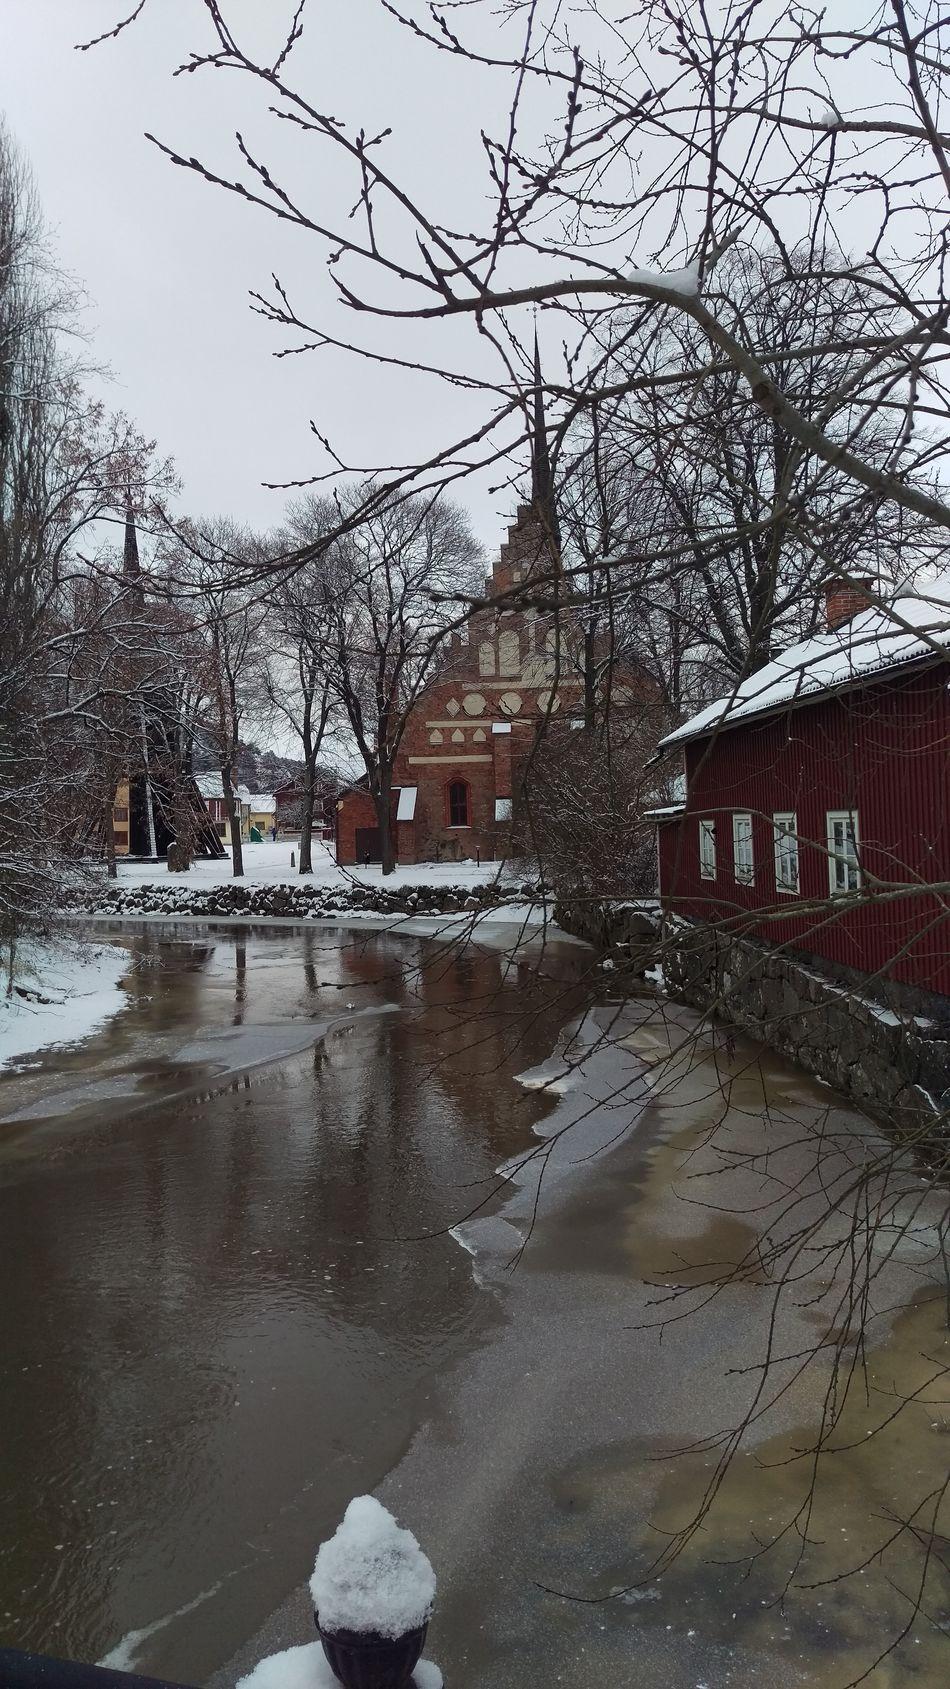 It's Cold Outside Söderköping Sweden Scandinavia Sverige Nortern Europe Cold Winter Wintertime Snow Snow ❄ Cityscape